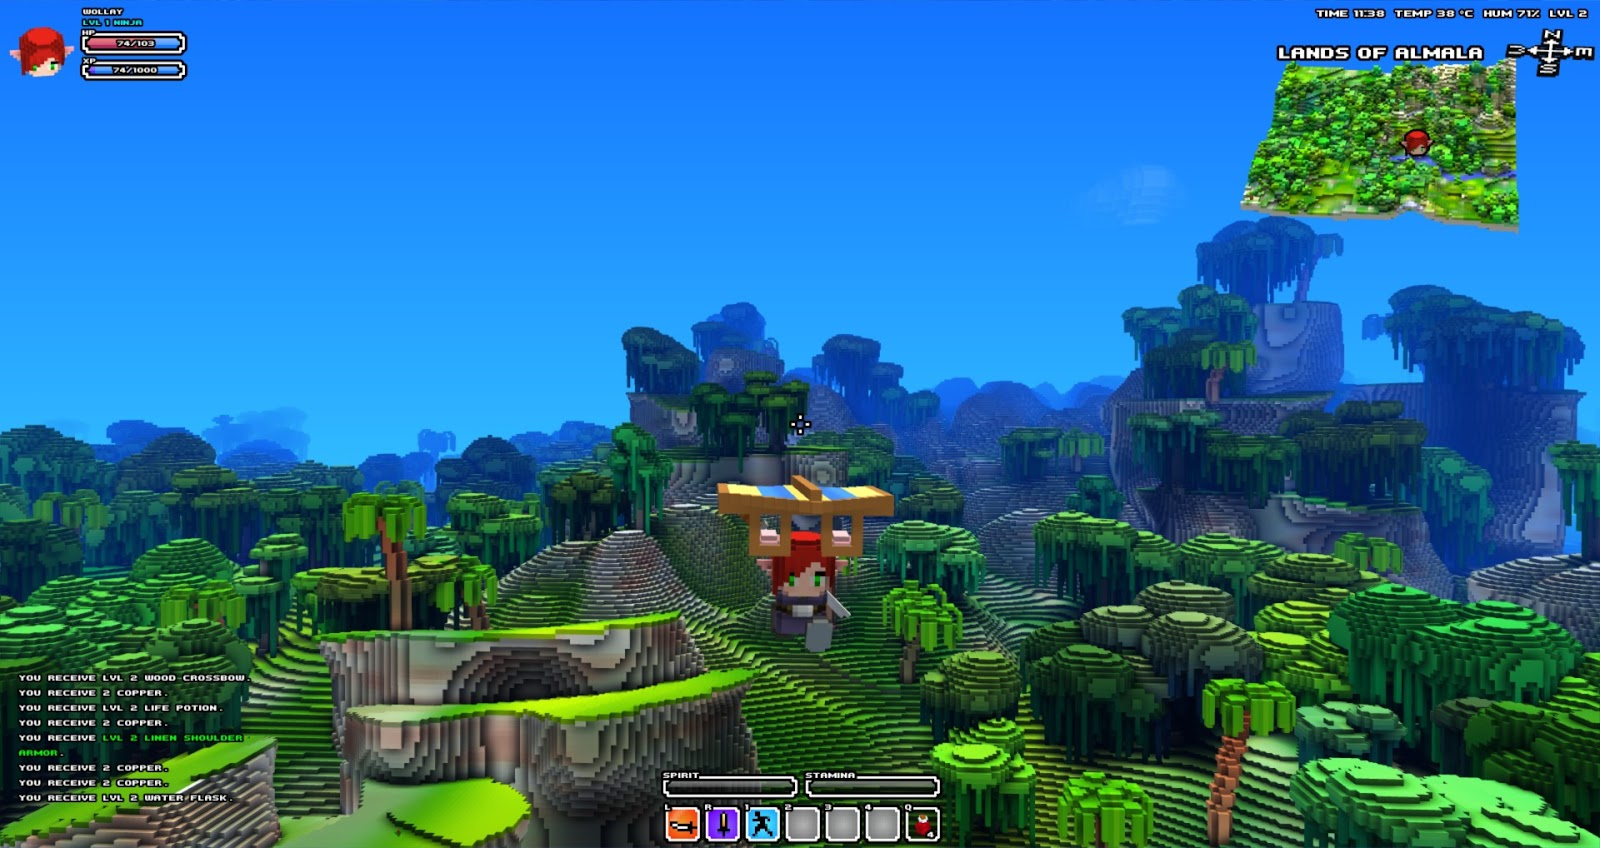 Wollays blog cube world landscape screenshots wollays blog gumiabroncs Choice Image